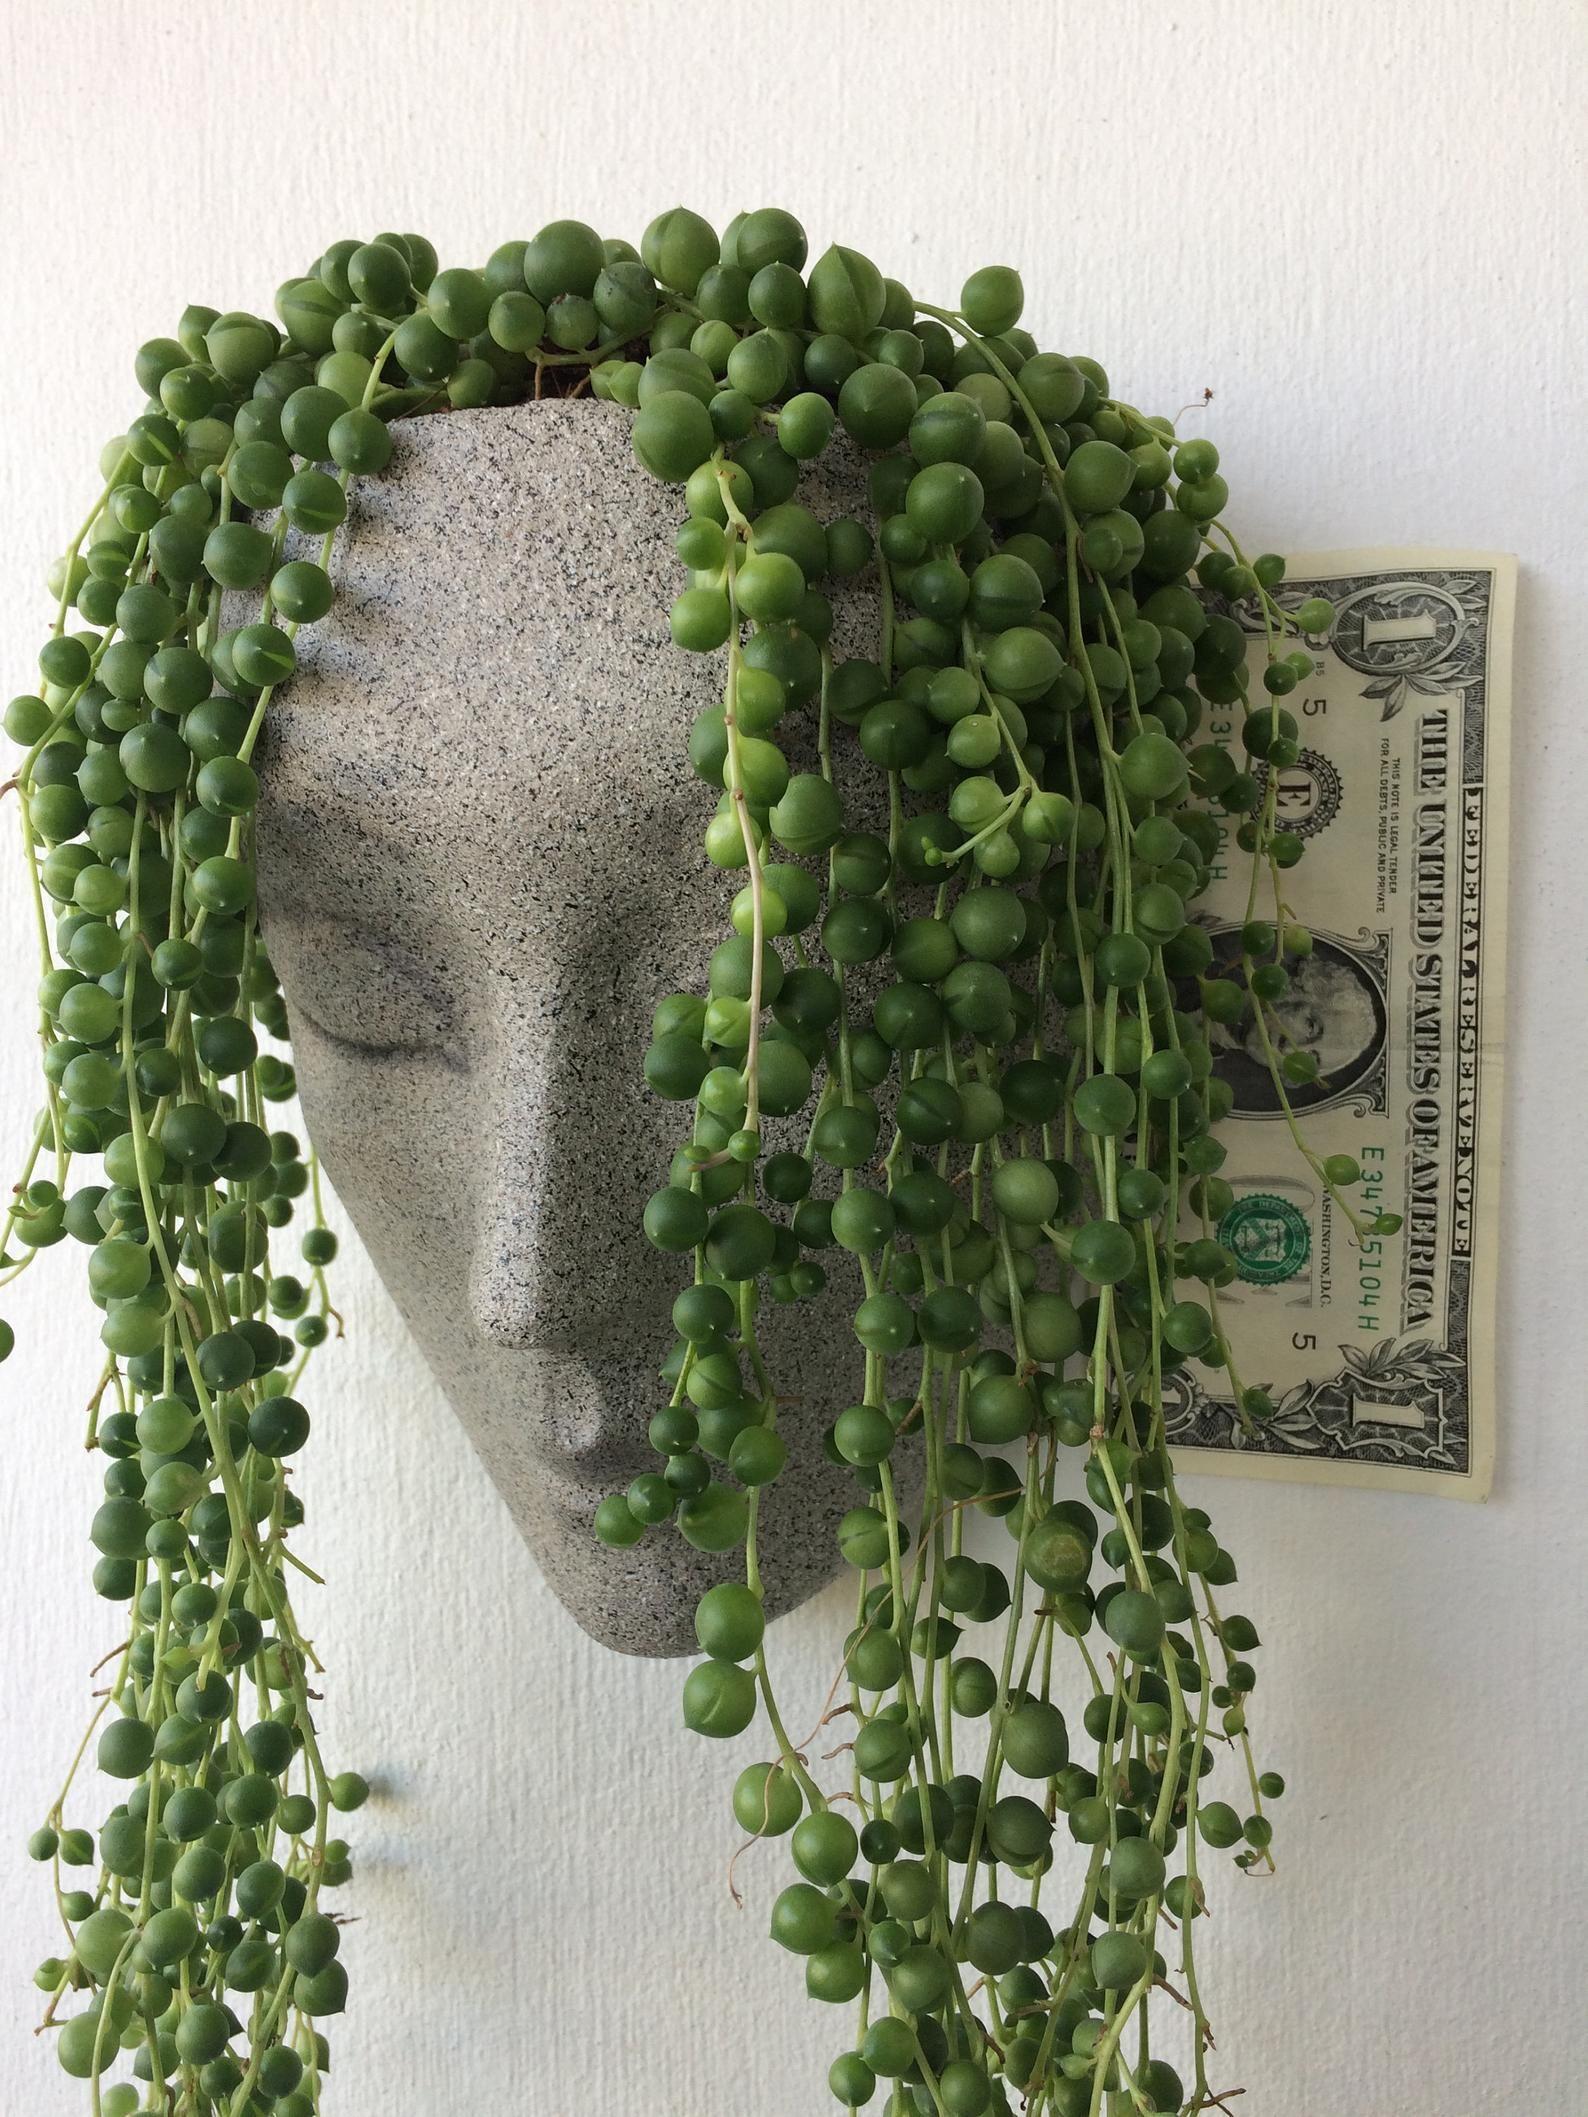 Vertical Planter Headplanters Concrete Planter Wall Etsy Face Planters Head Planters Wall Planter